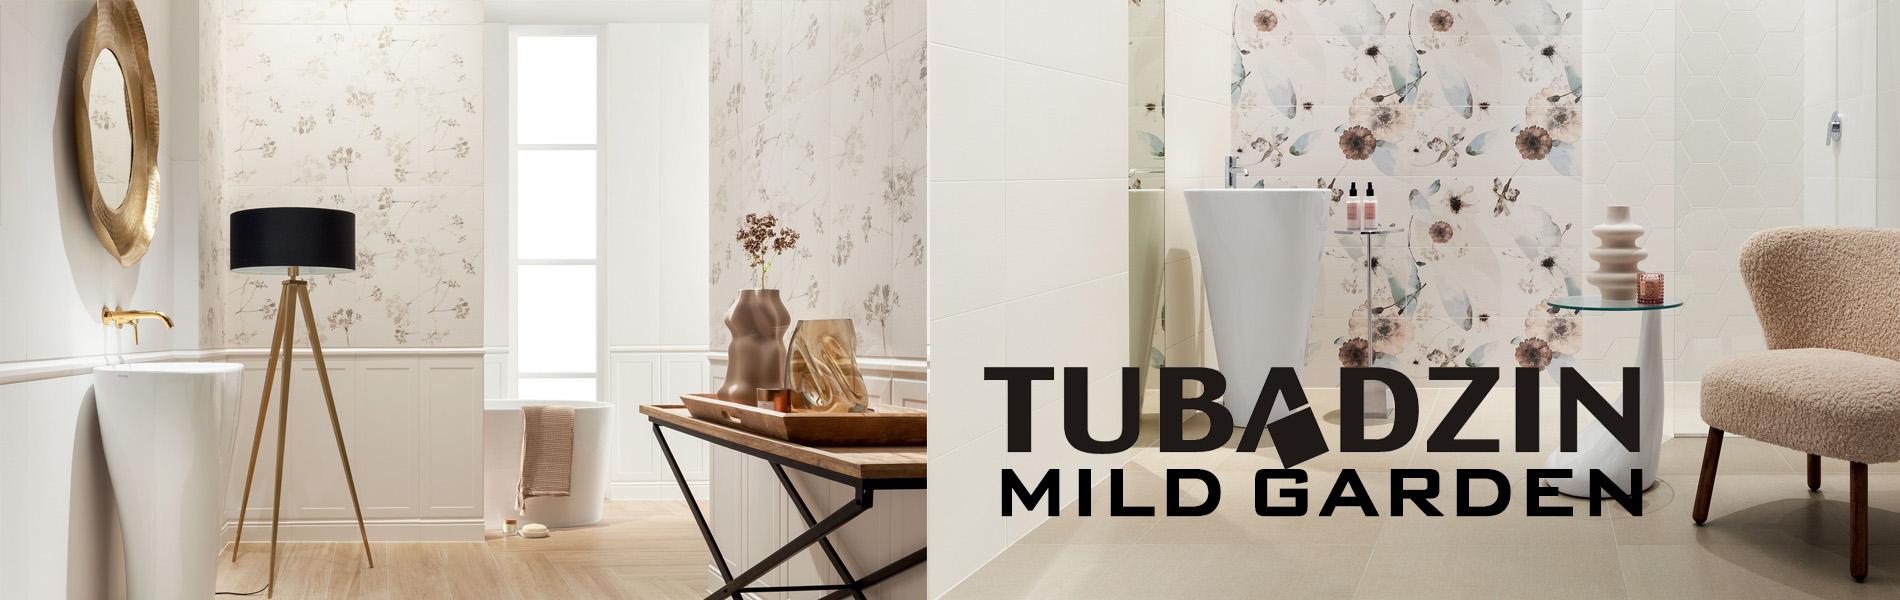 slide_tubadzin1